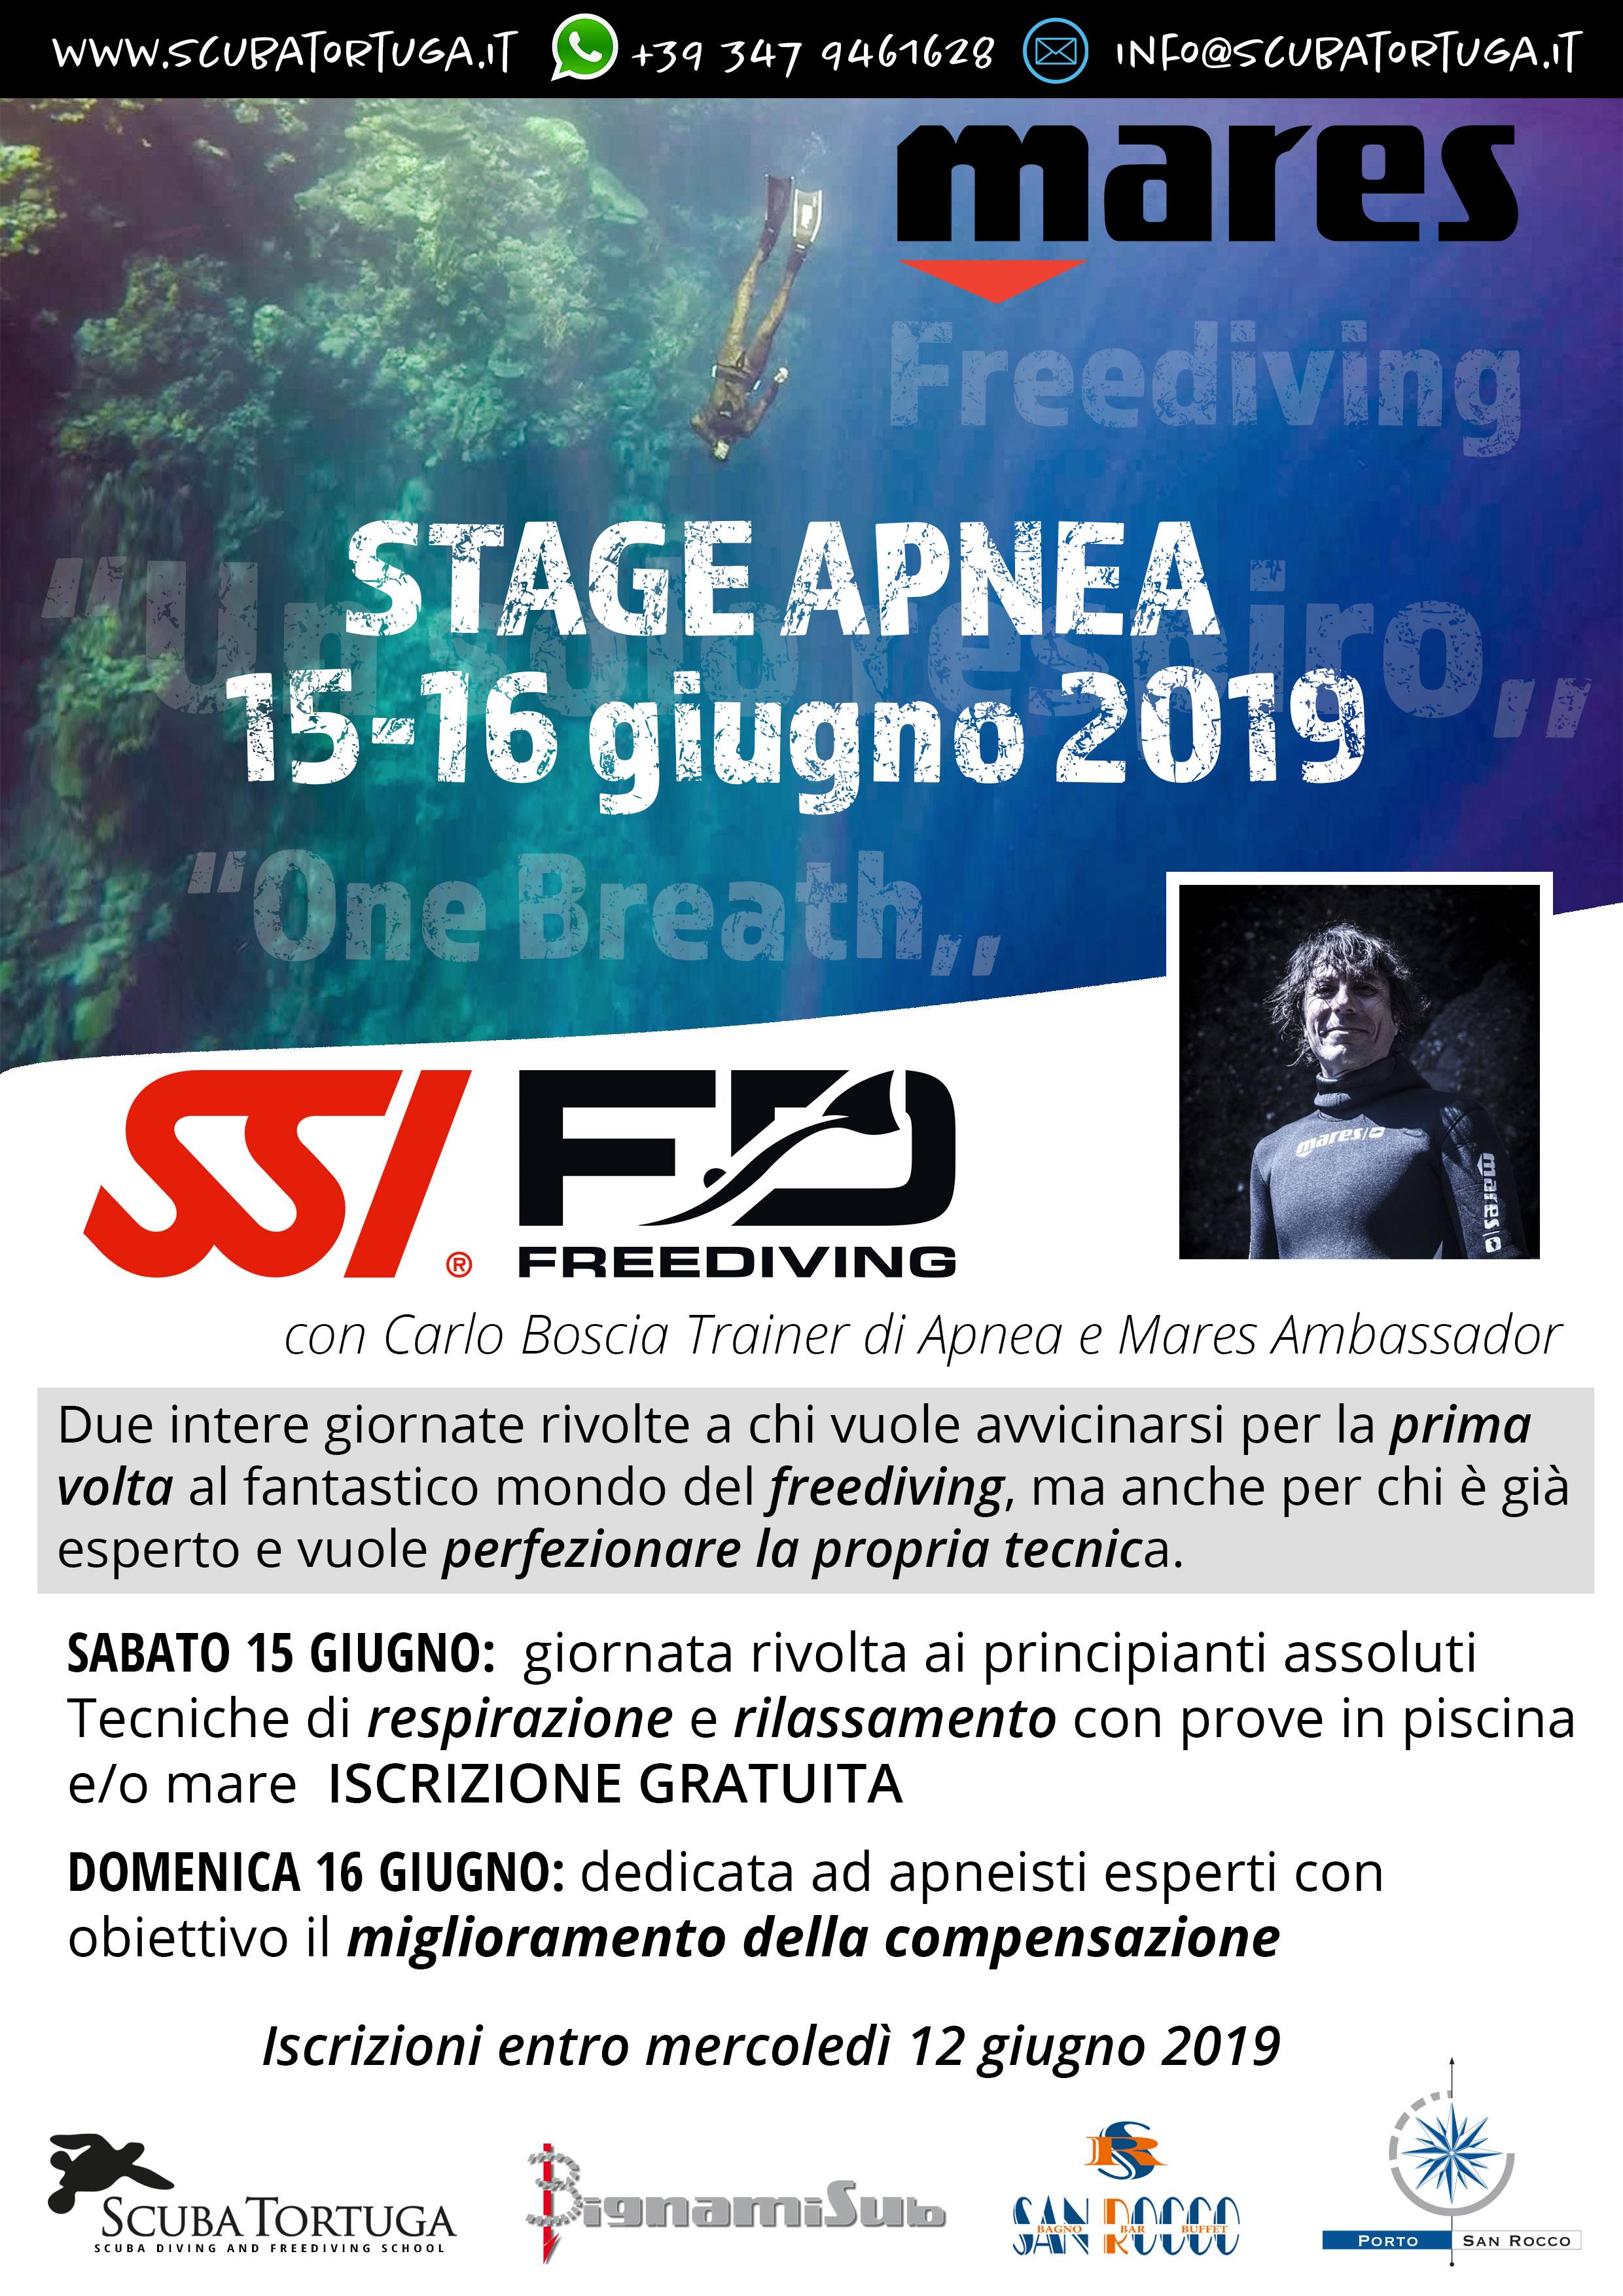 Apnea Trieste, Freediving Trieste, corsi apnea Trieste, corsi Freediving Trieste, Carlo Boscia, Cristina Polselli, Mauro MIchelutti